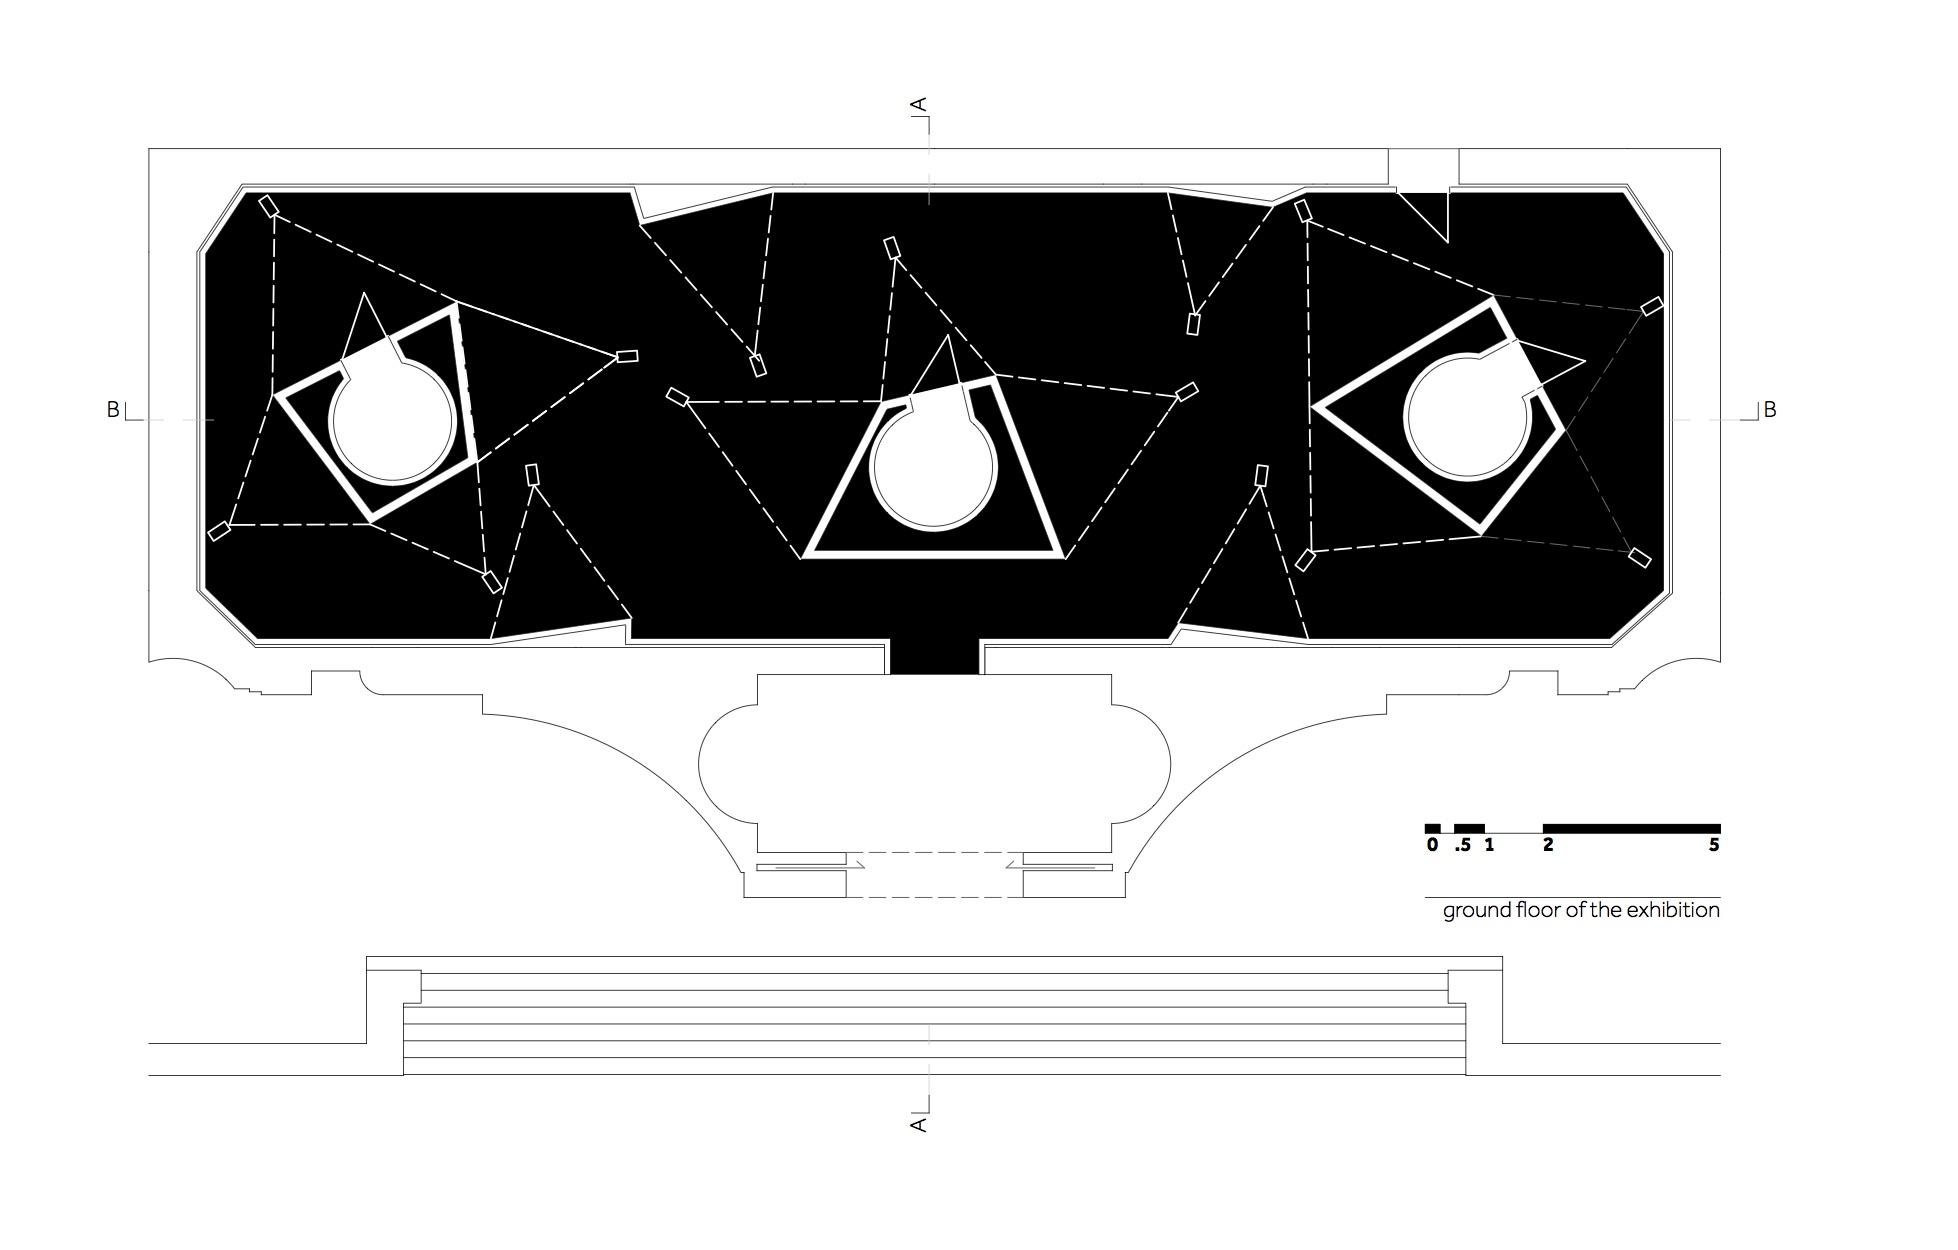 MHS - Bienala de la Venetia - W.02 Plan_en